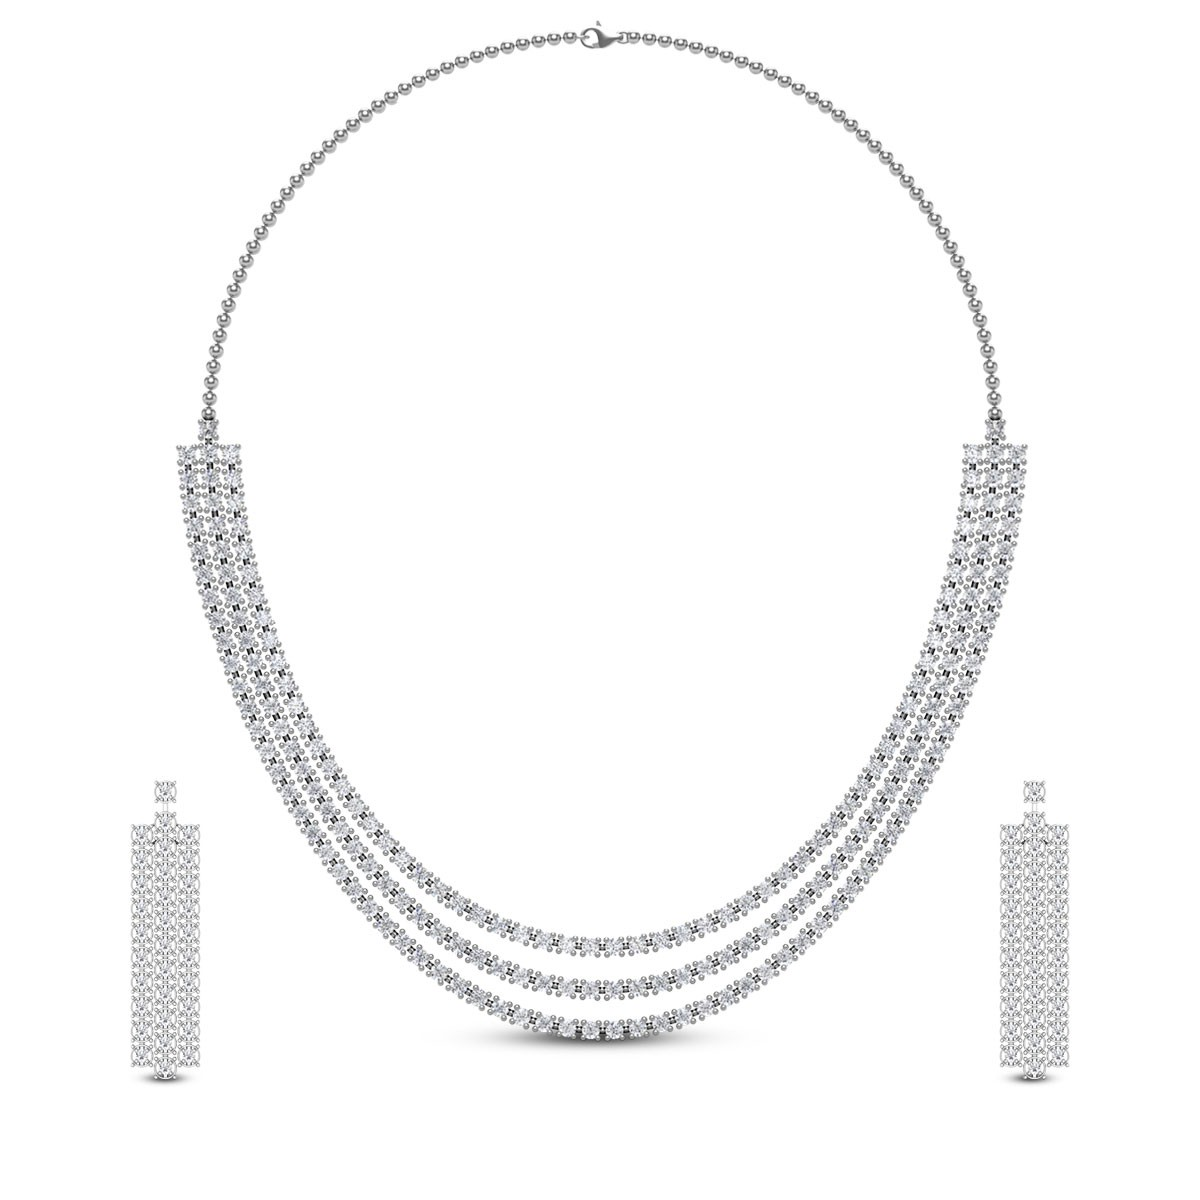 Kashika Diamond Necklace Set